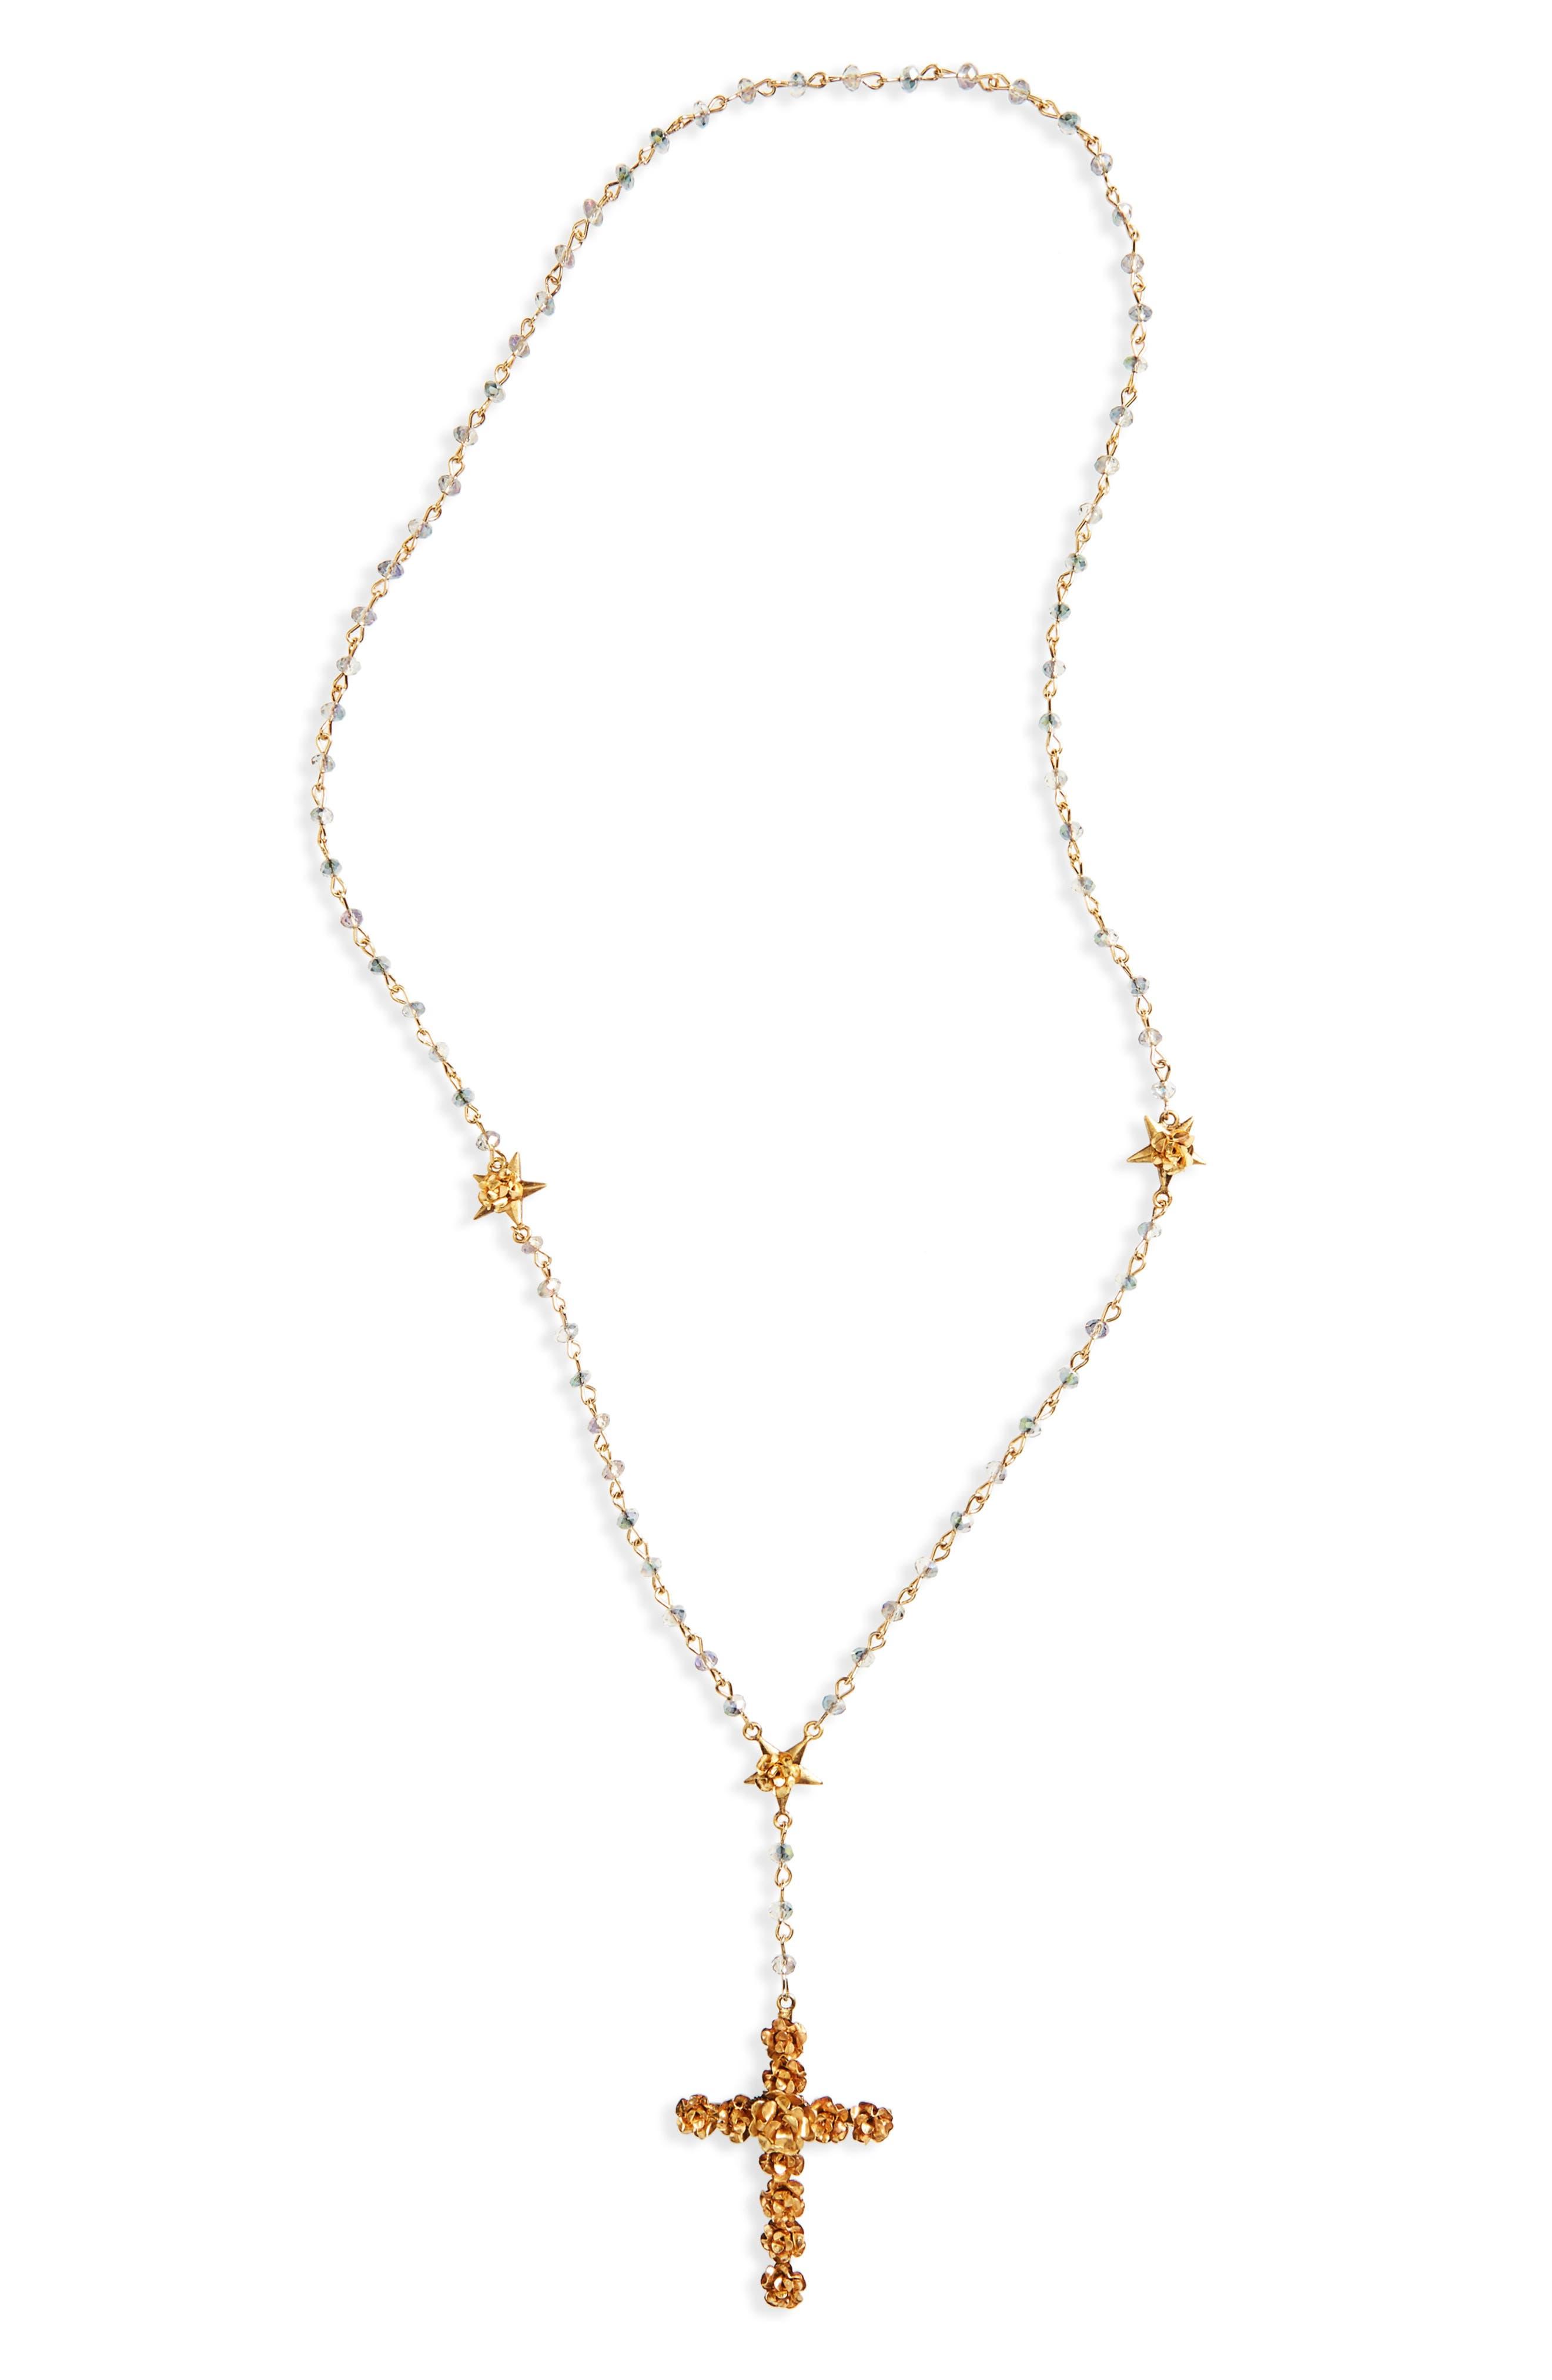 Main Image - Virgins Saints & Angels Coronation Crystal Rosary Necklace